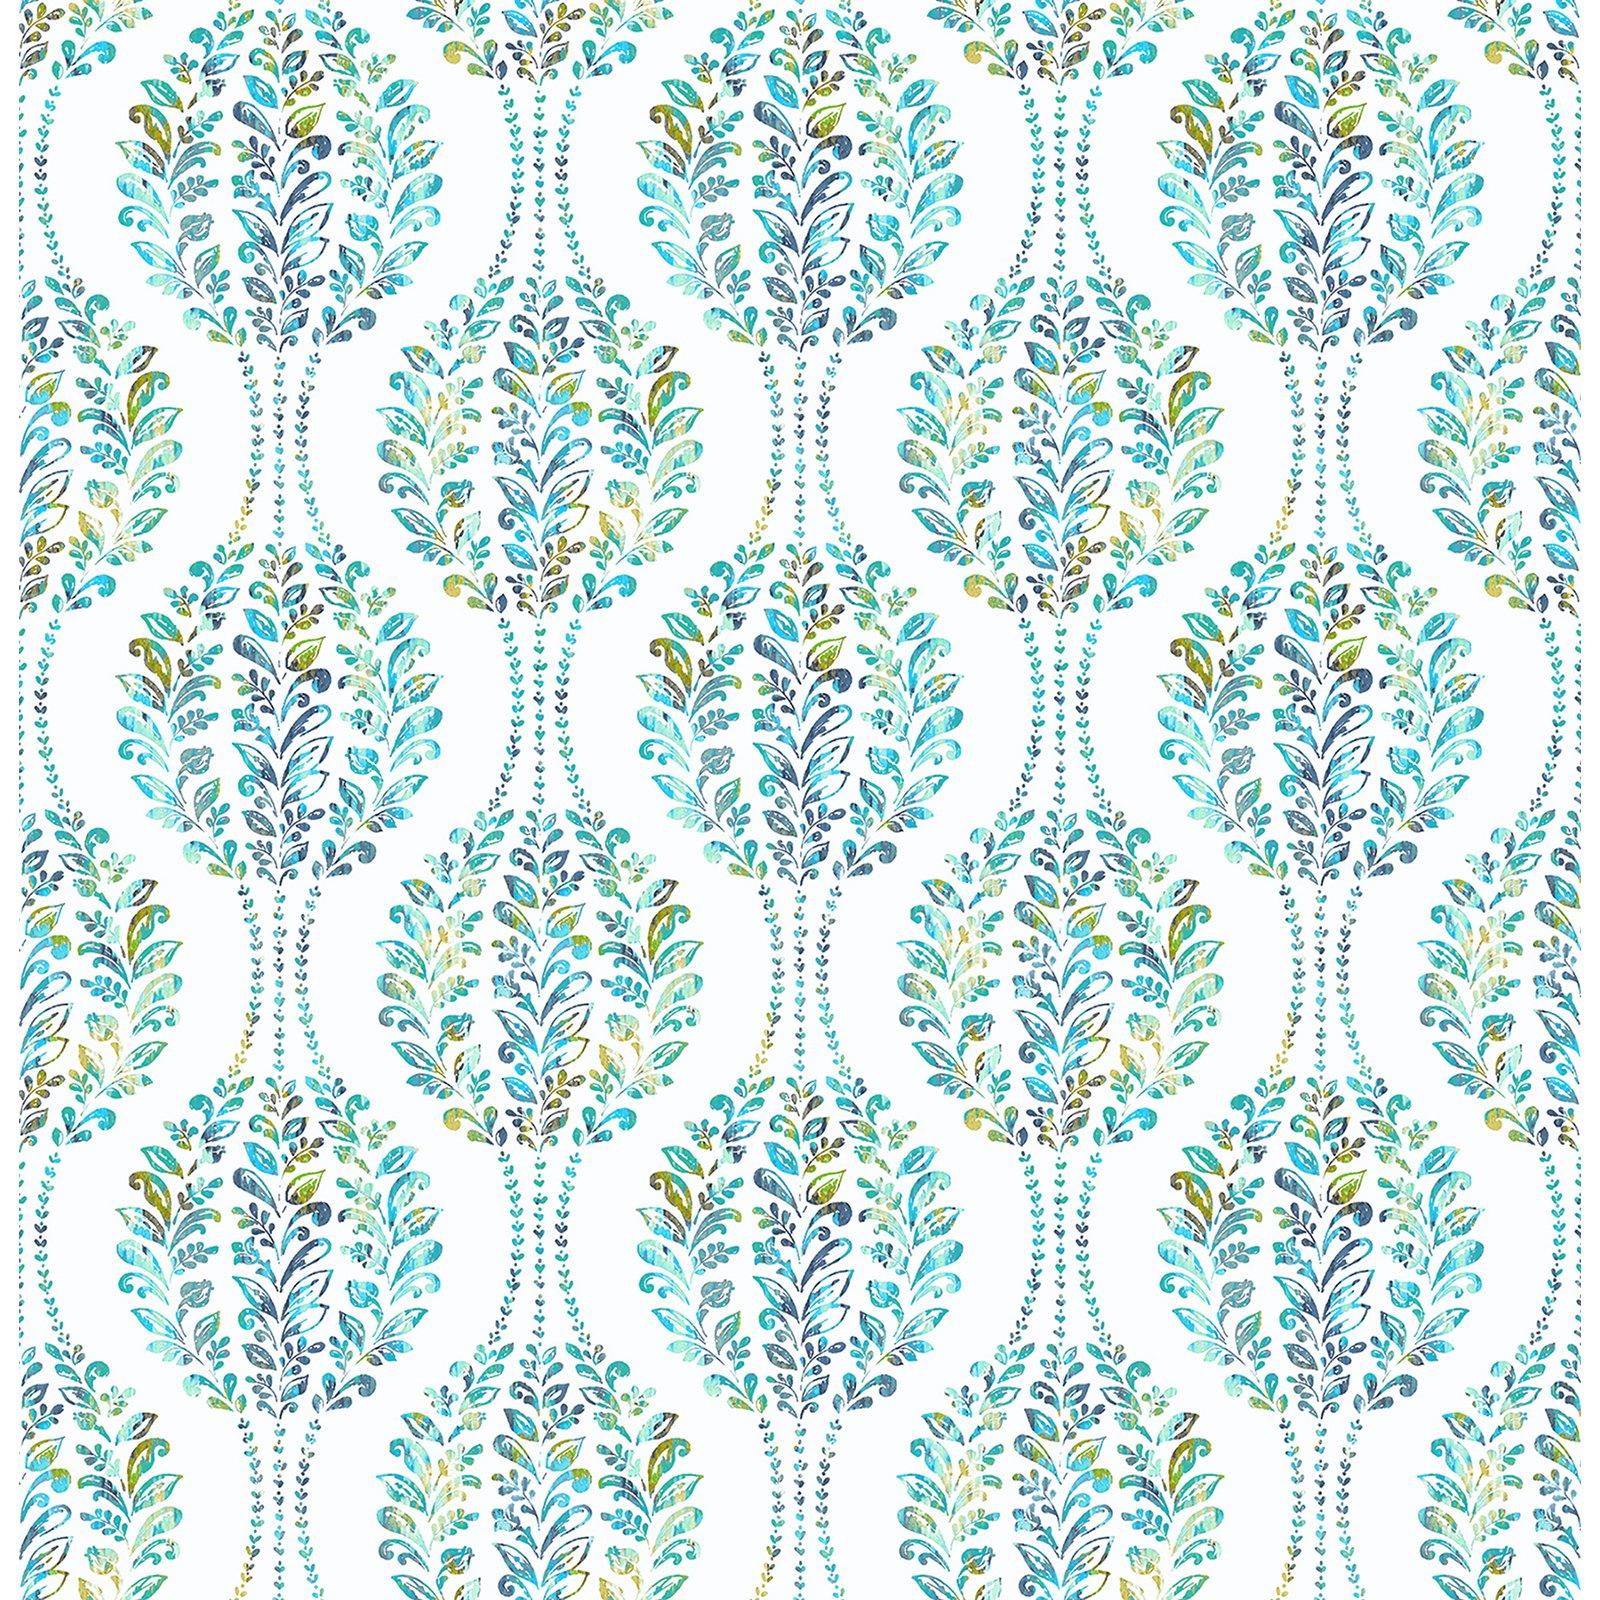 A - Street Prints Mirabelle Versailles Floral Damask Wallpaper